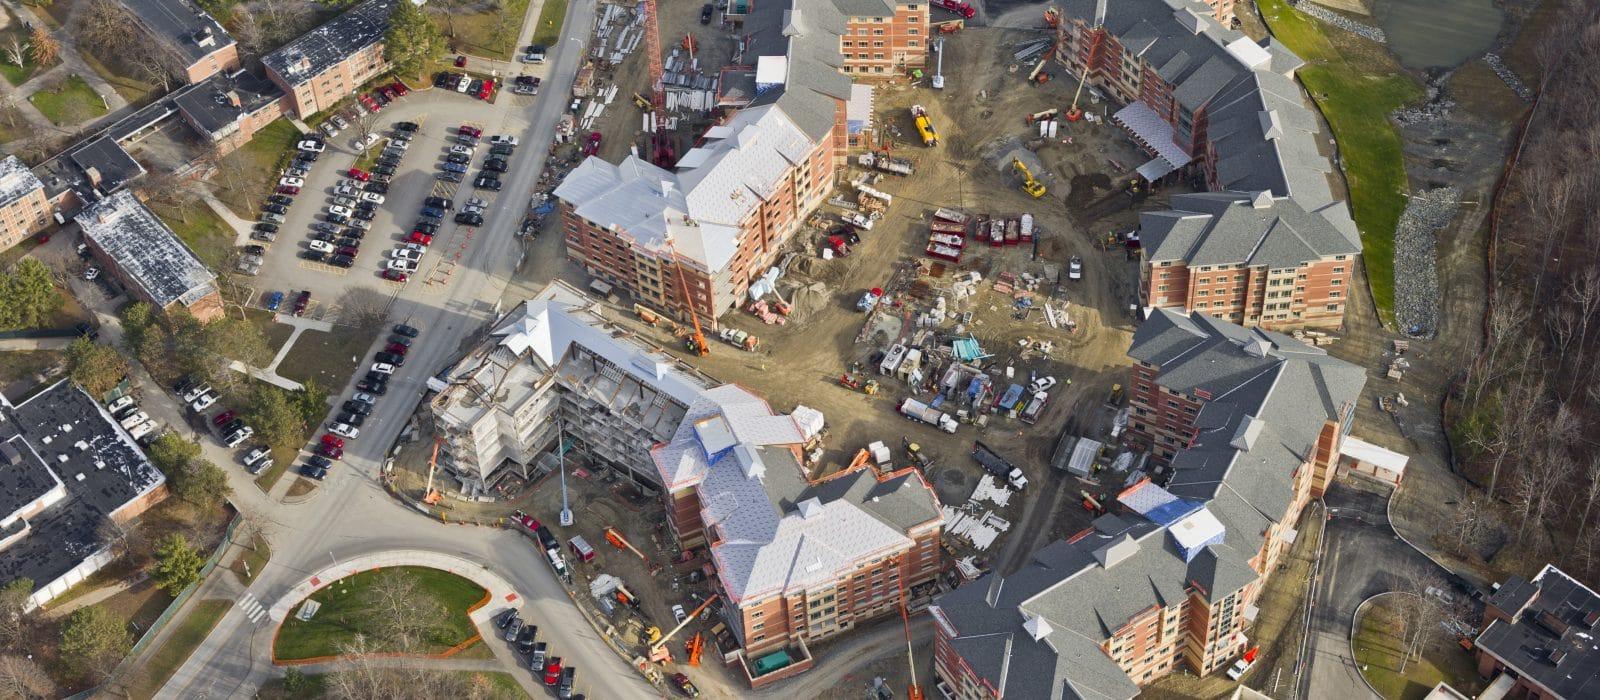 Binghamton University East Campus Housing steel frame structure